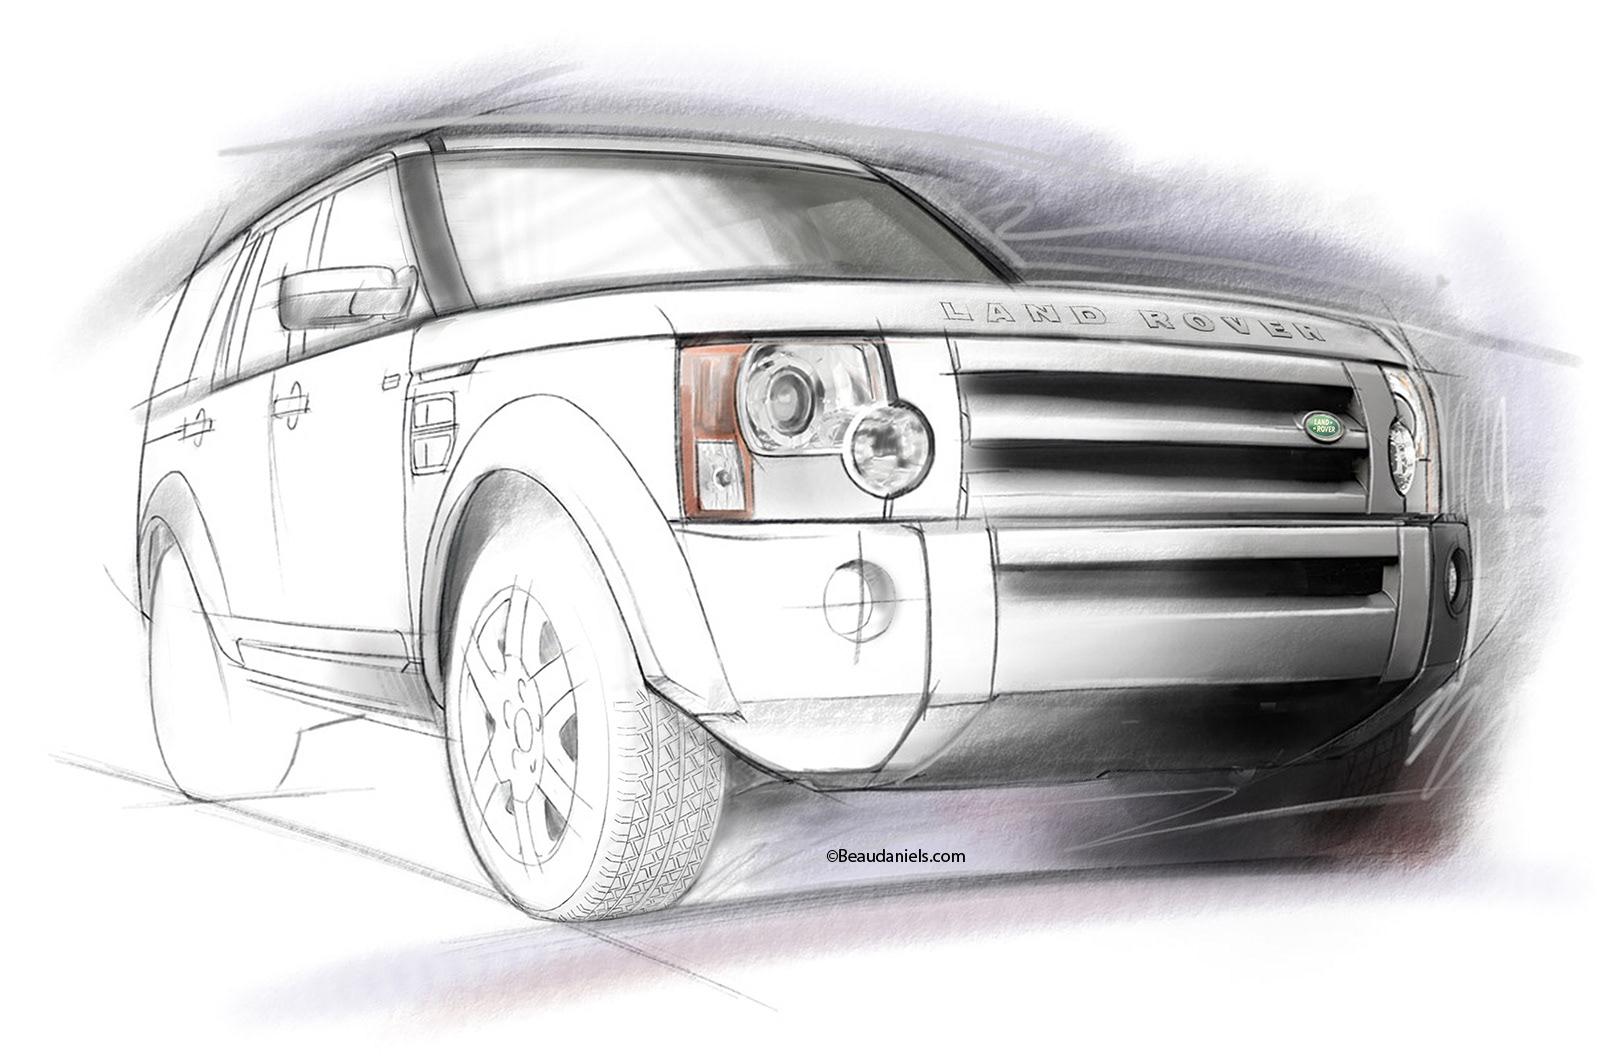 Technical Illustration, Beau And Alan Daniels.